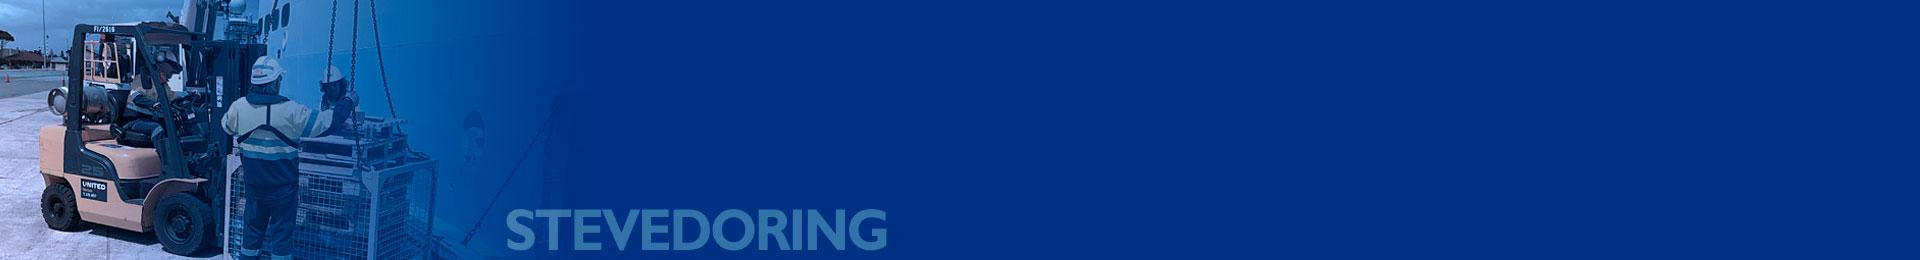 stevedoring services three ocean maritime